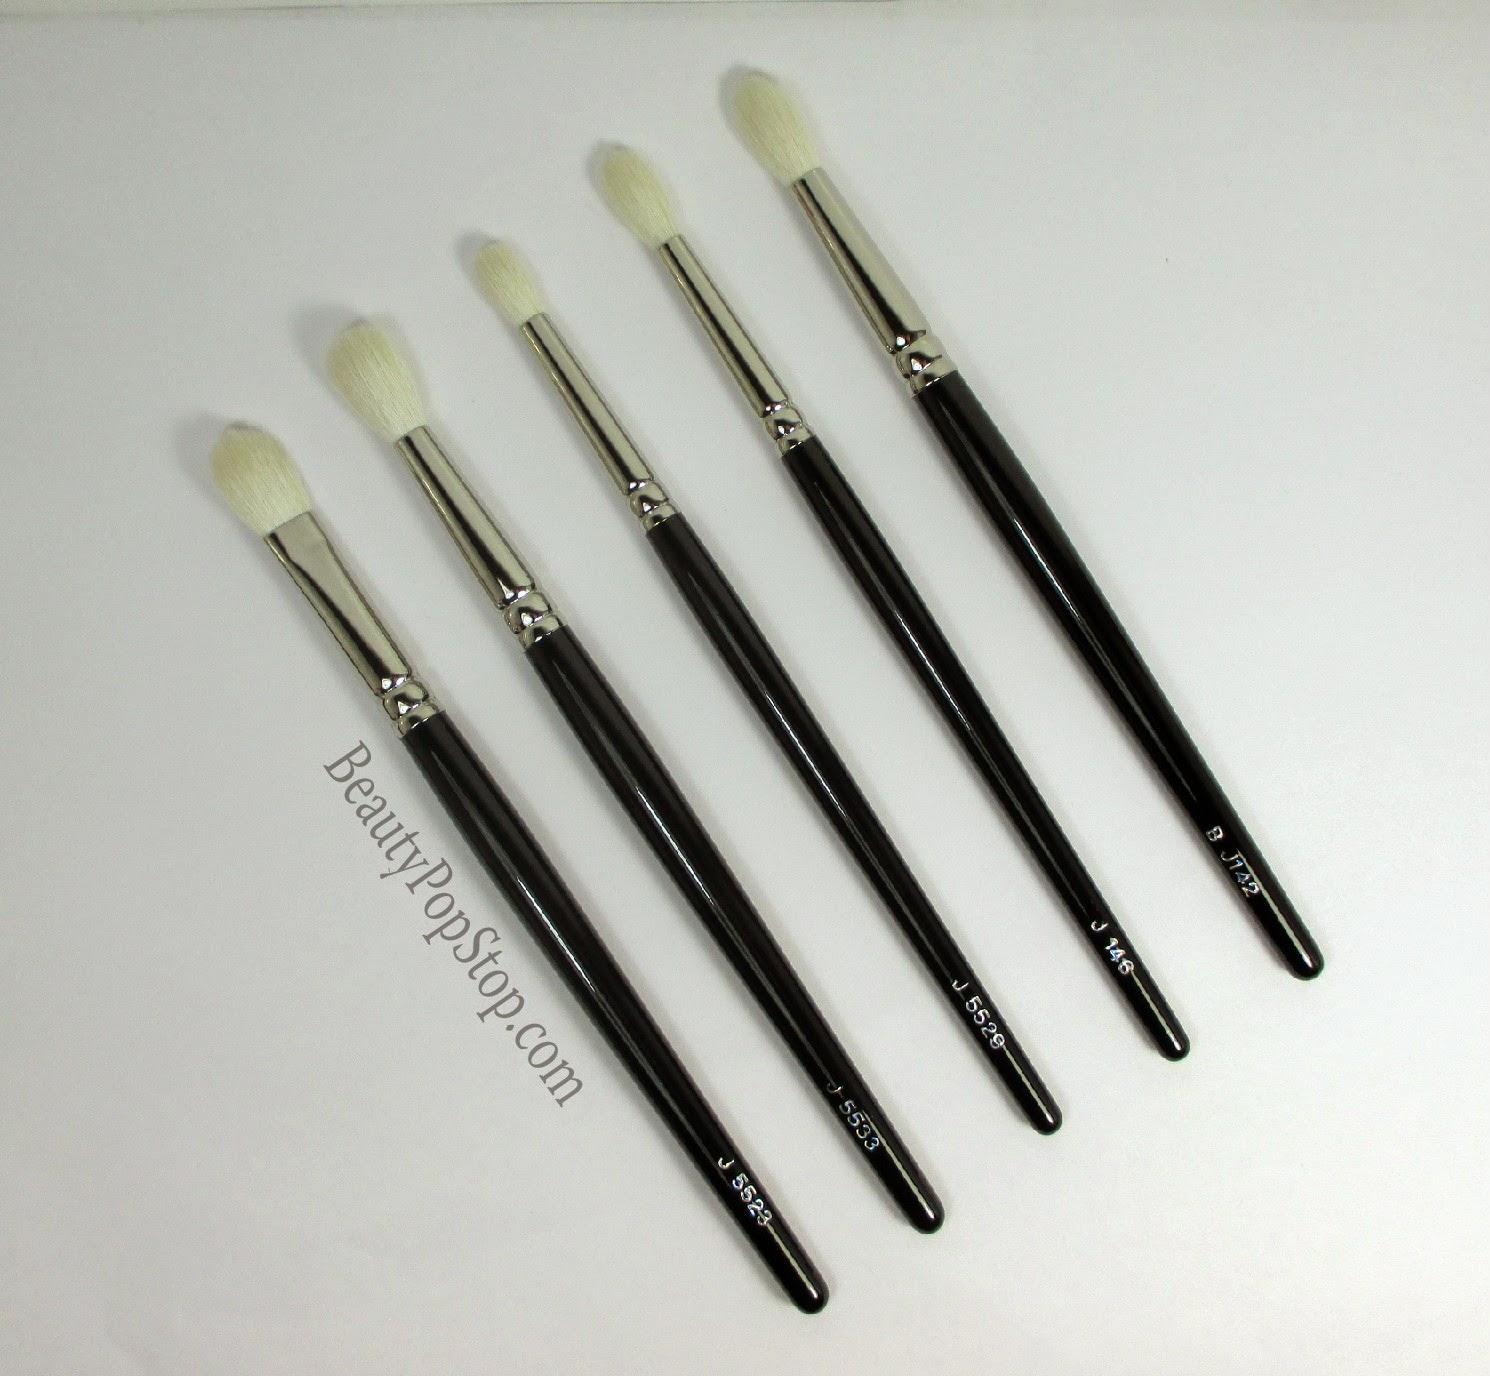 Beautypopstop Hakuhodo Blending Brushes Reviews